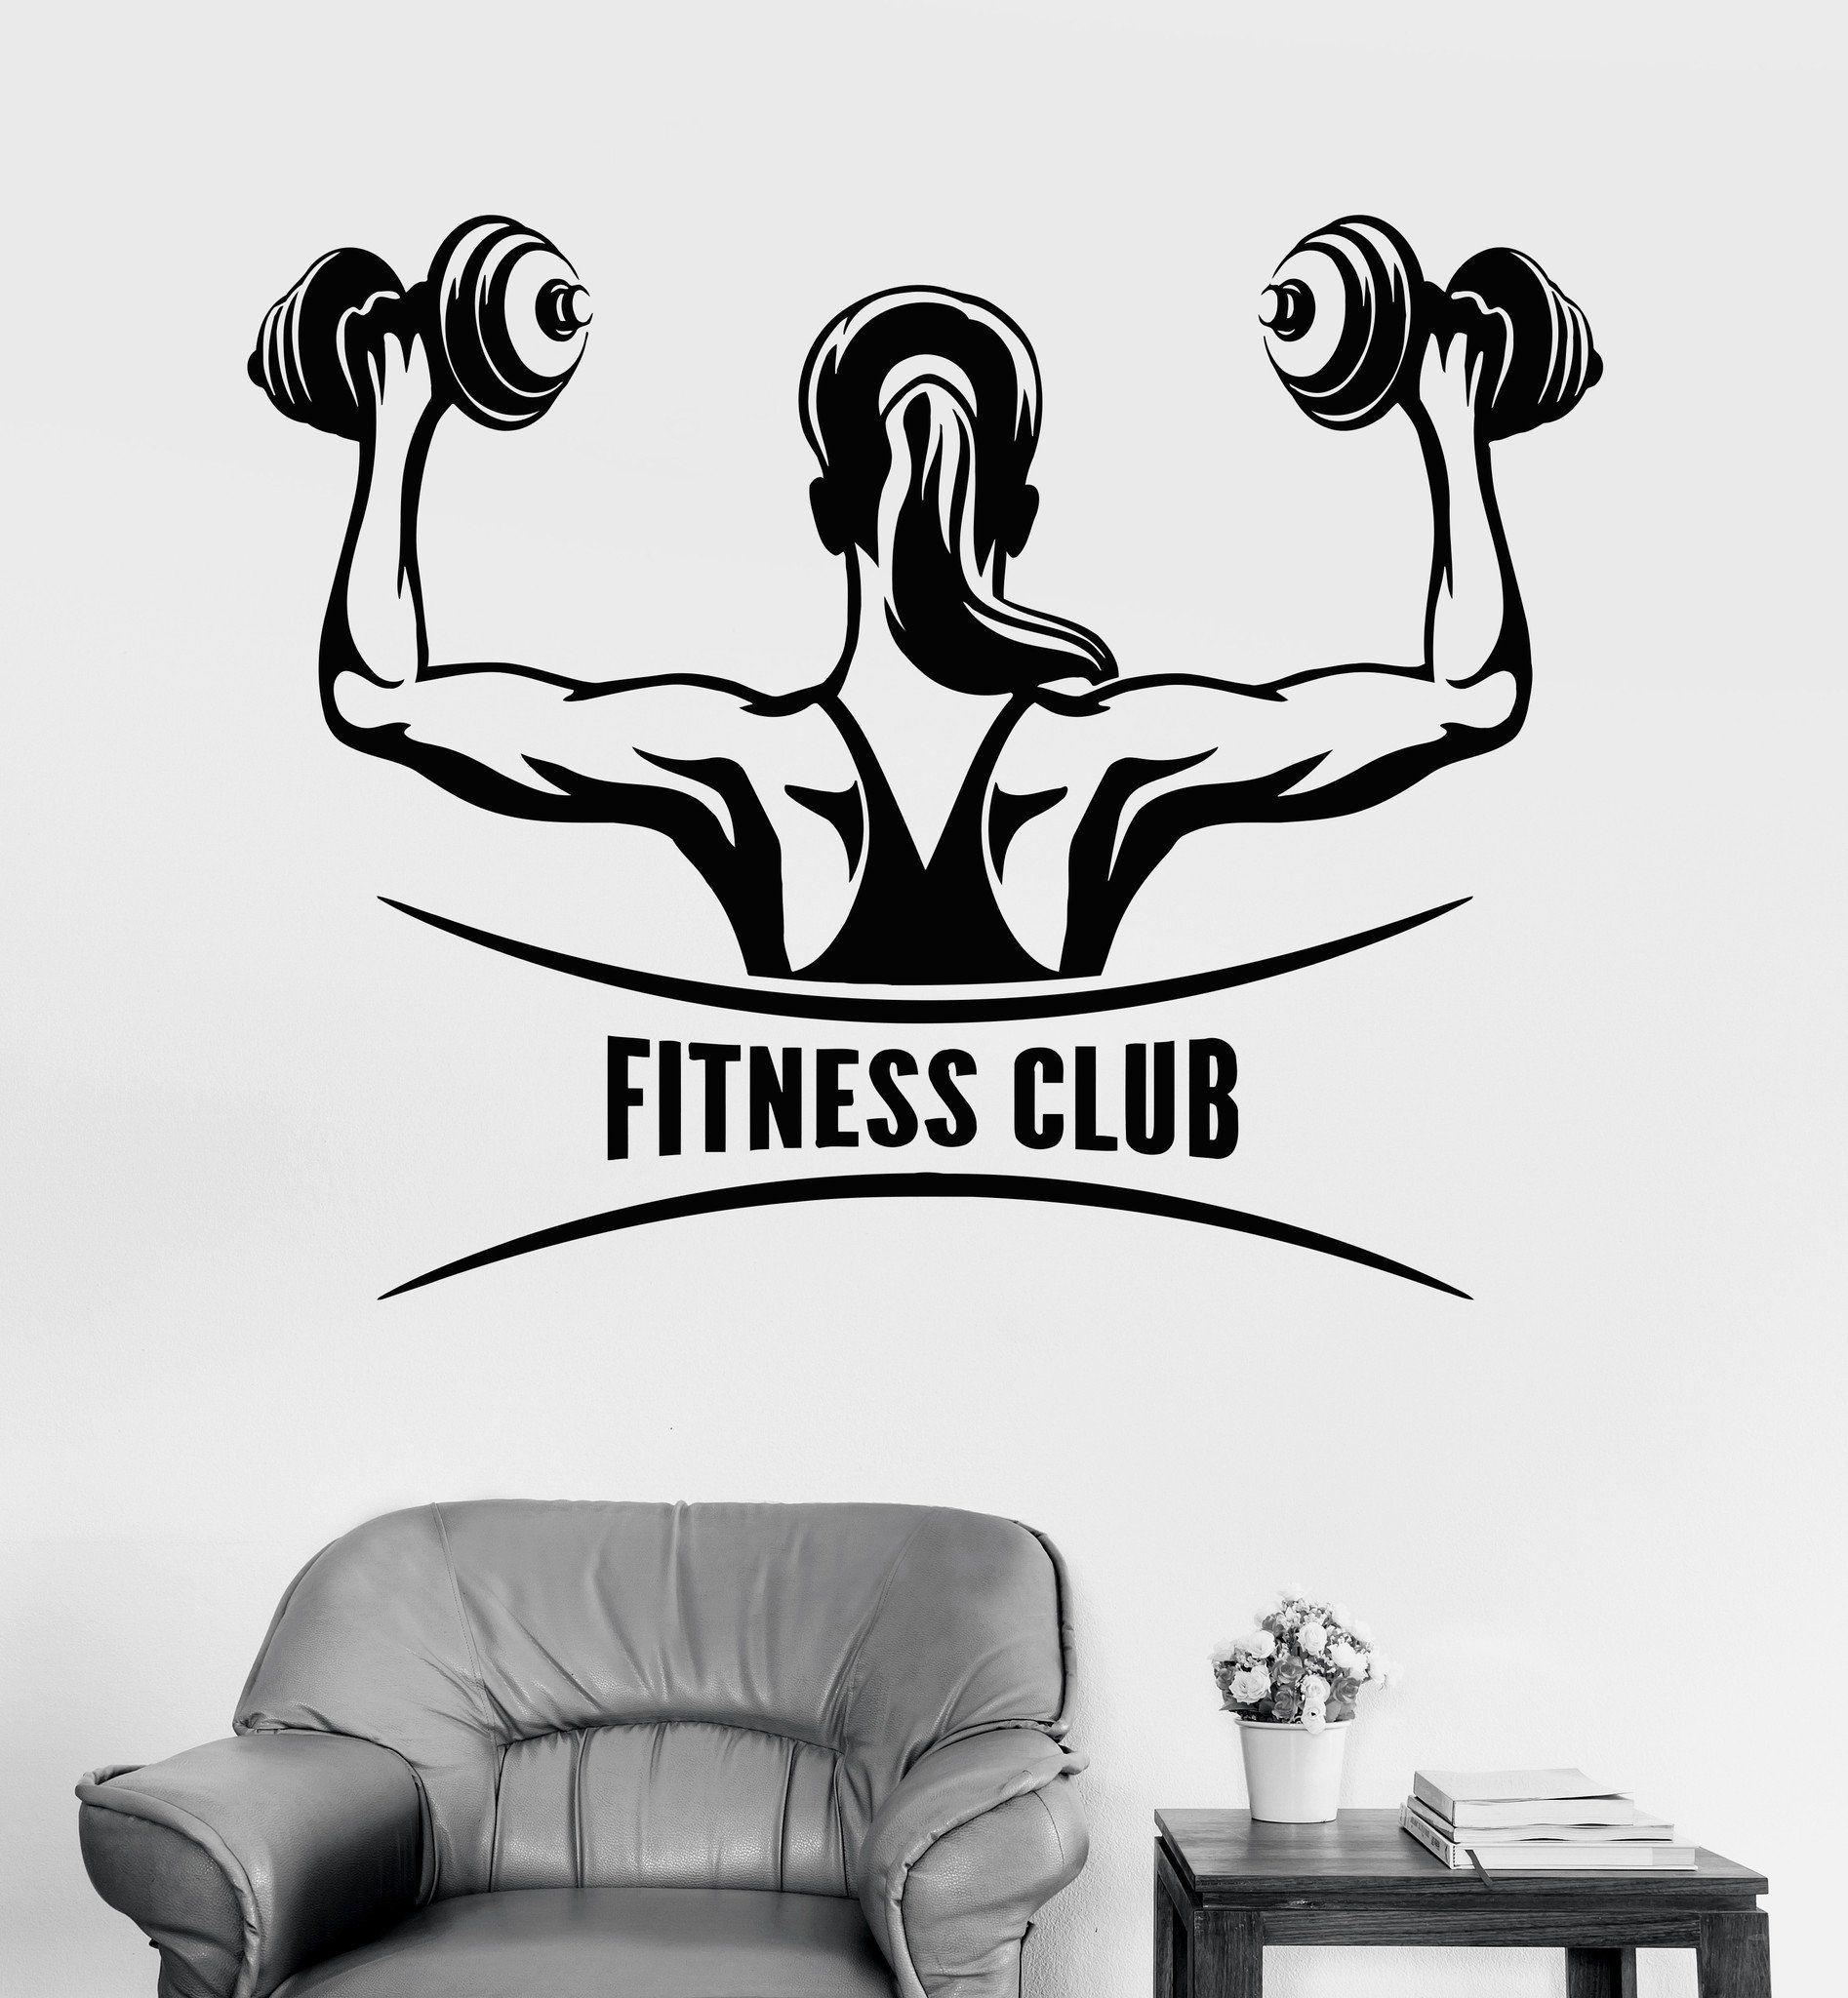 Vinyl Wall Decal Fitness Club Logo Woman Gym Girl Motivation Stickers Unique Gift Ig3495 Gym Girls Gym Women Fitness Club